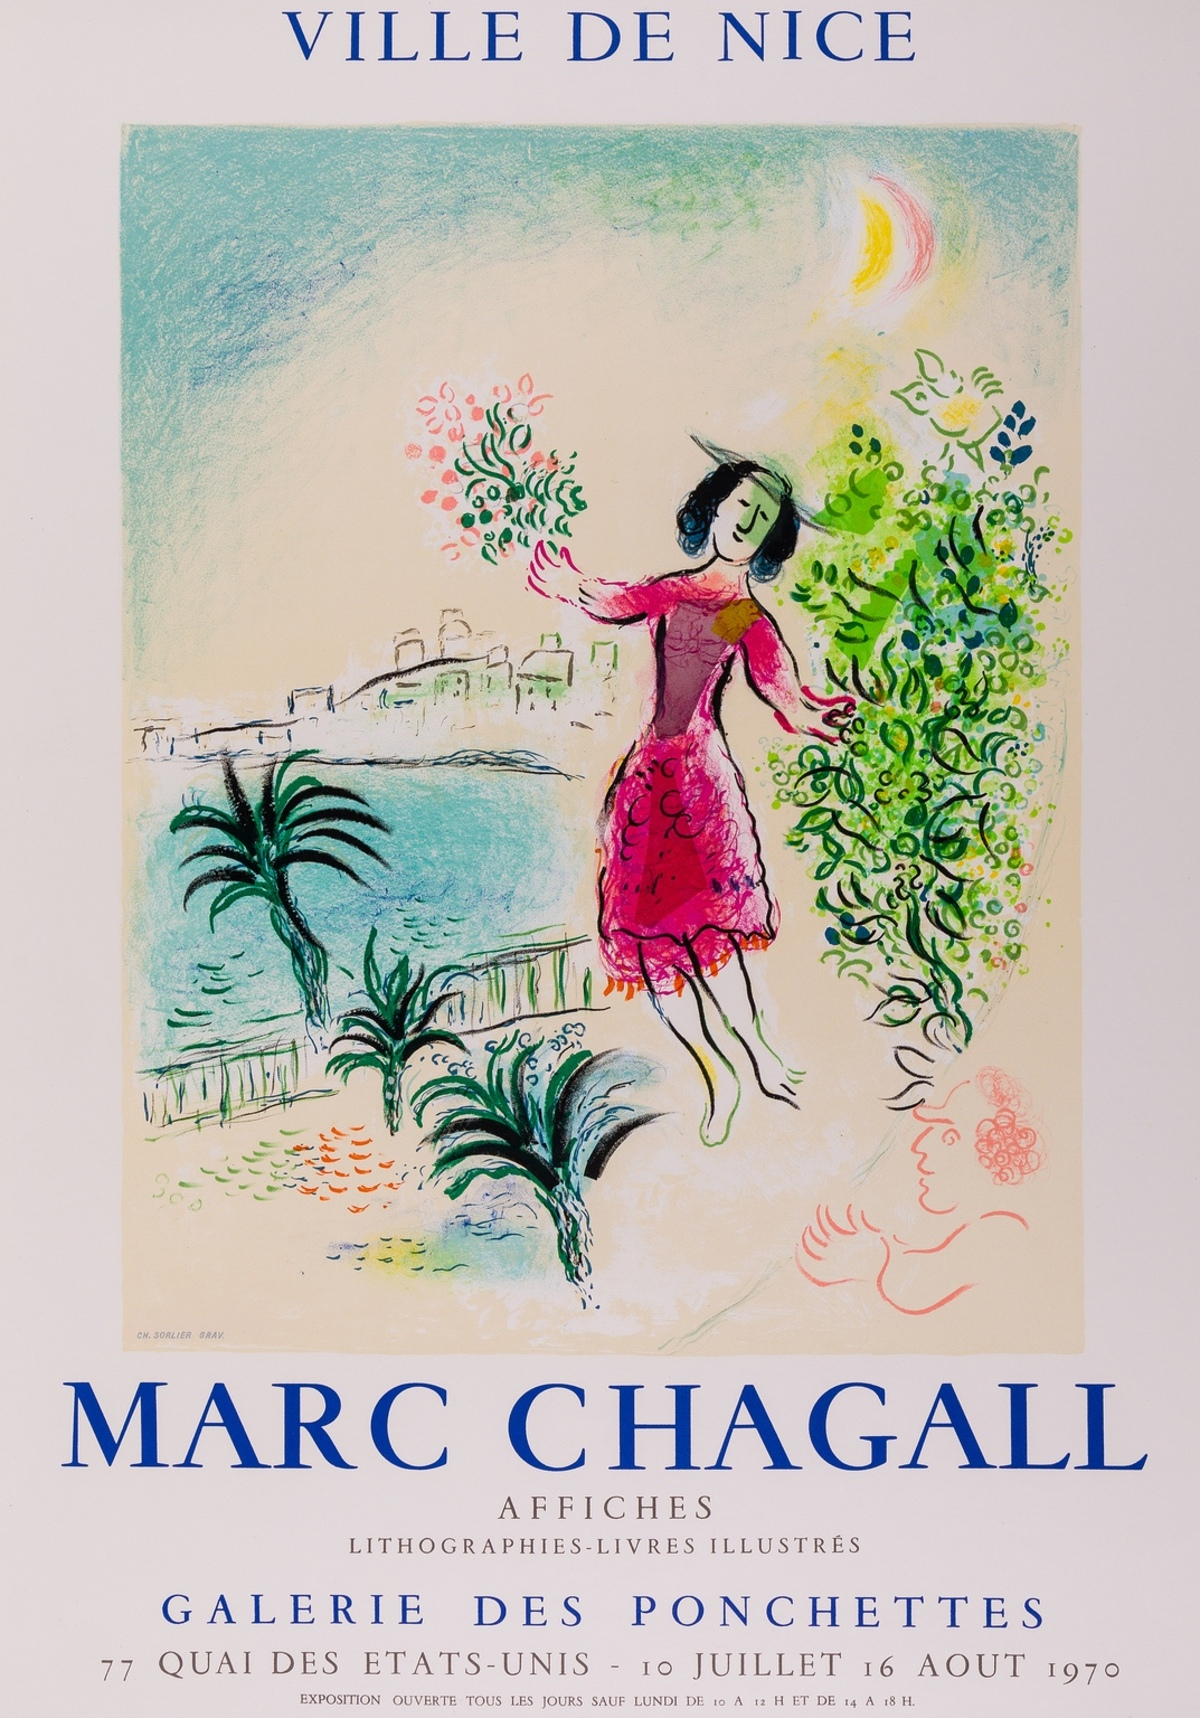 Marc Chagall (1887-1985) (after) Ville de Nice